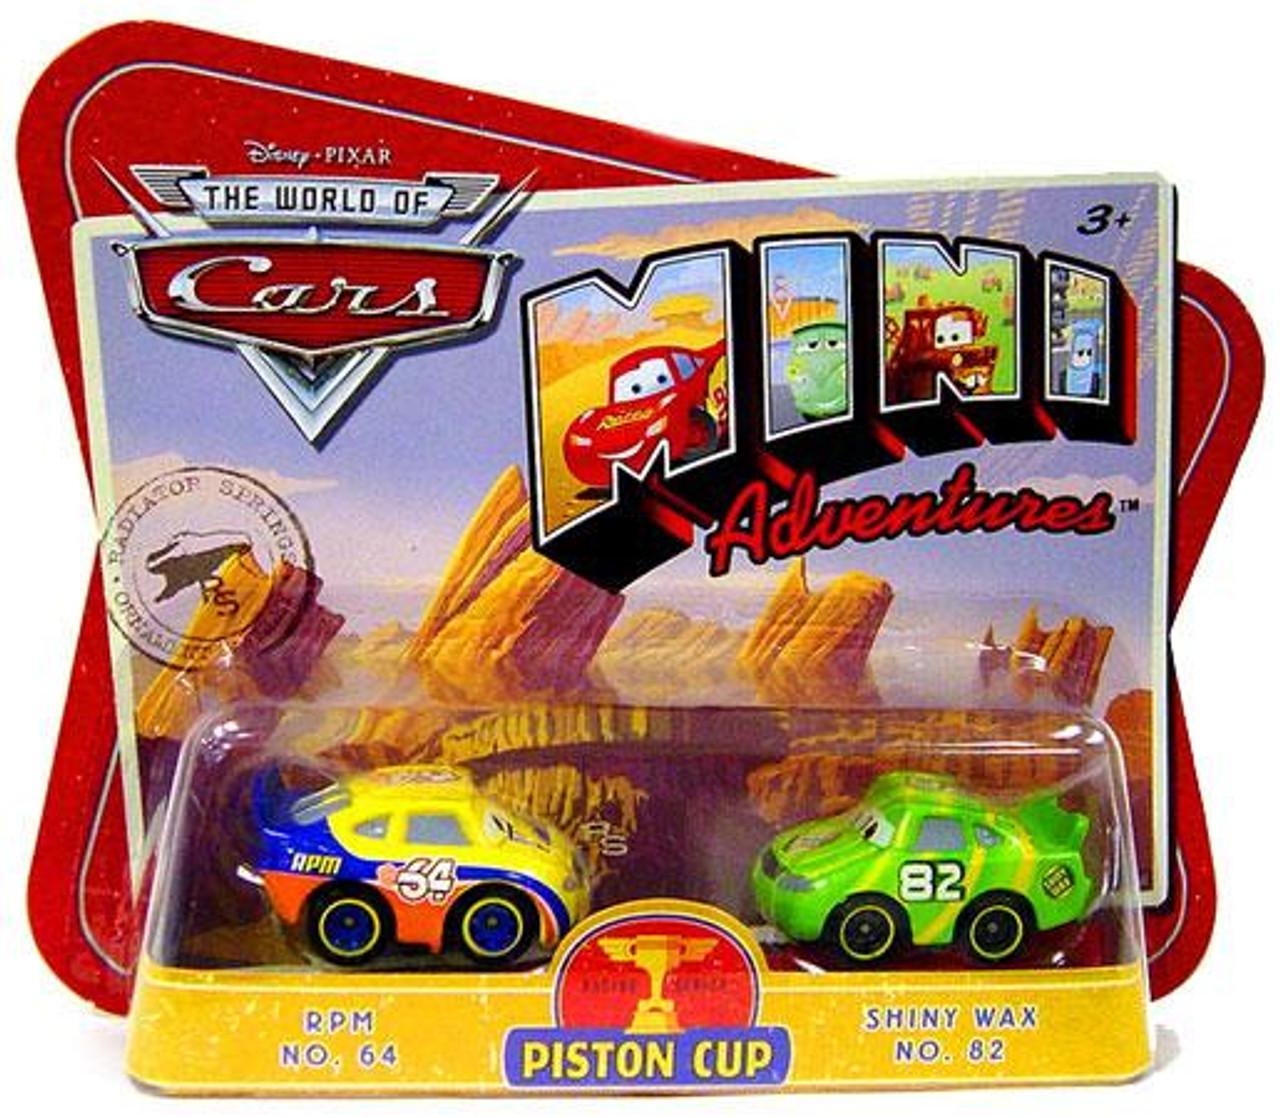 Disney Cars The World of Cars Mini Adventures Piston Cup Plastic Car 2-Pack [RPM No. 64 & Shiny Wax No. 82]